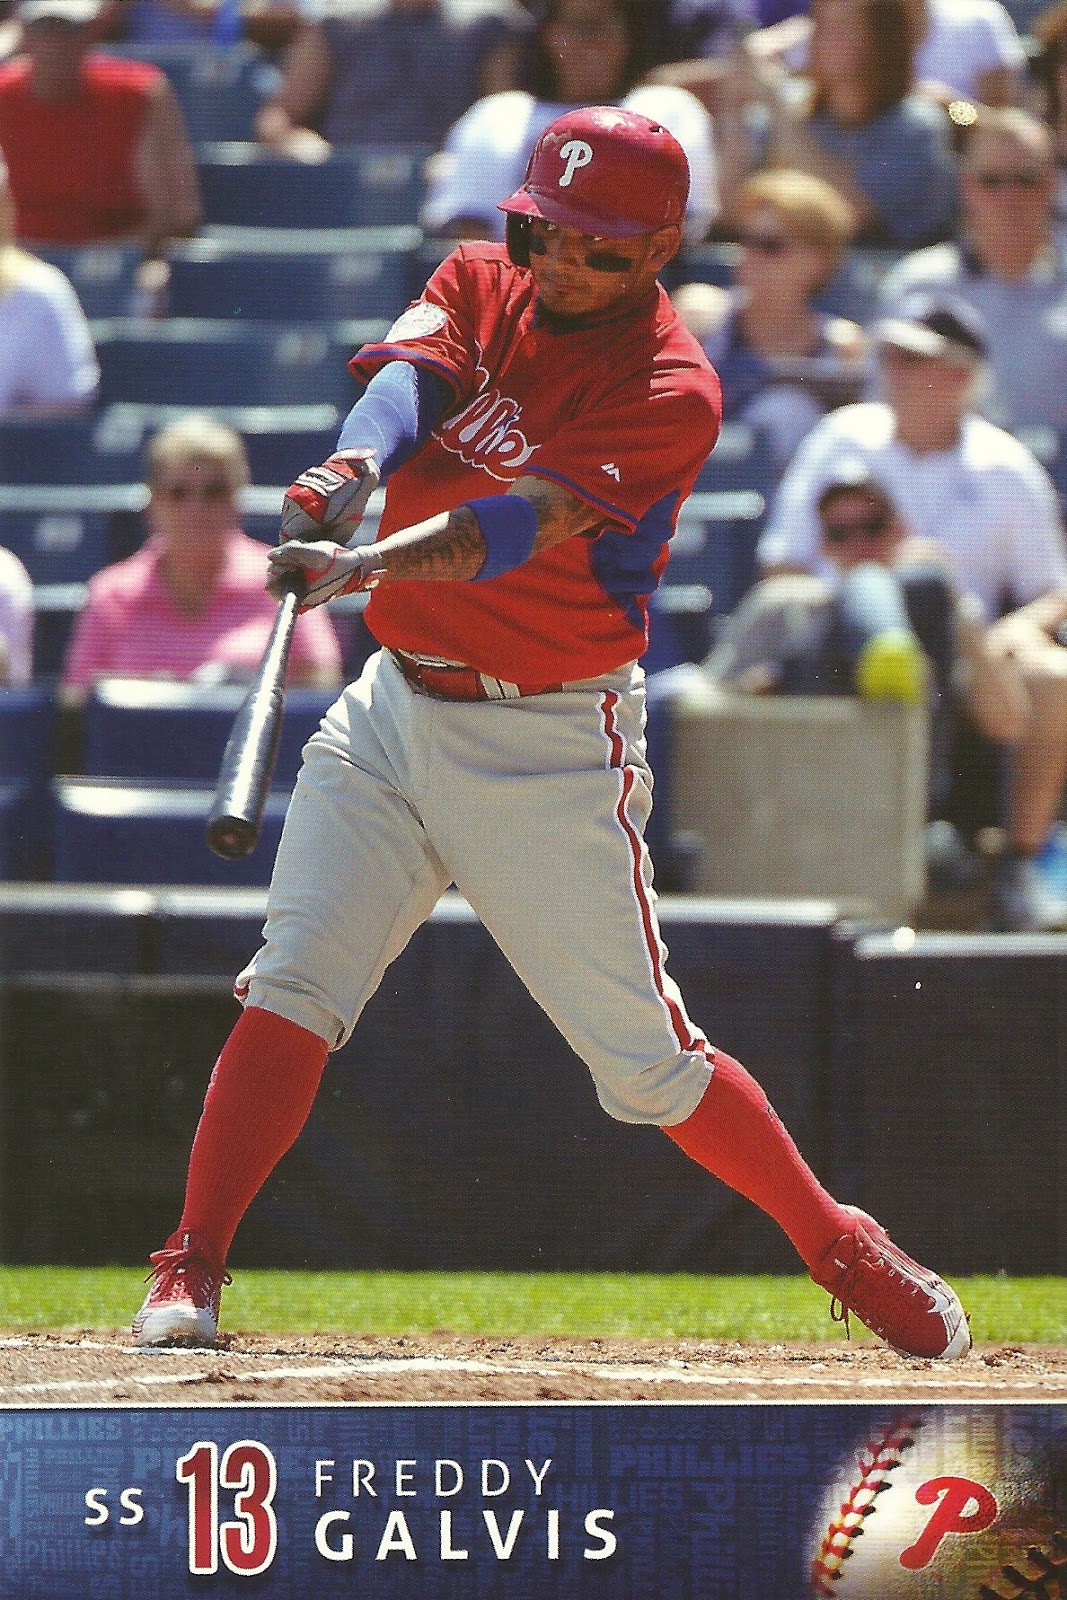 2015 Phillies Team Issue #13 Freddy Galvis